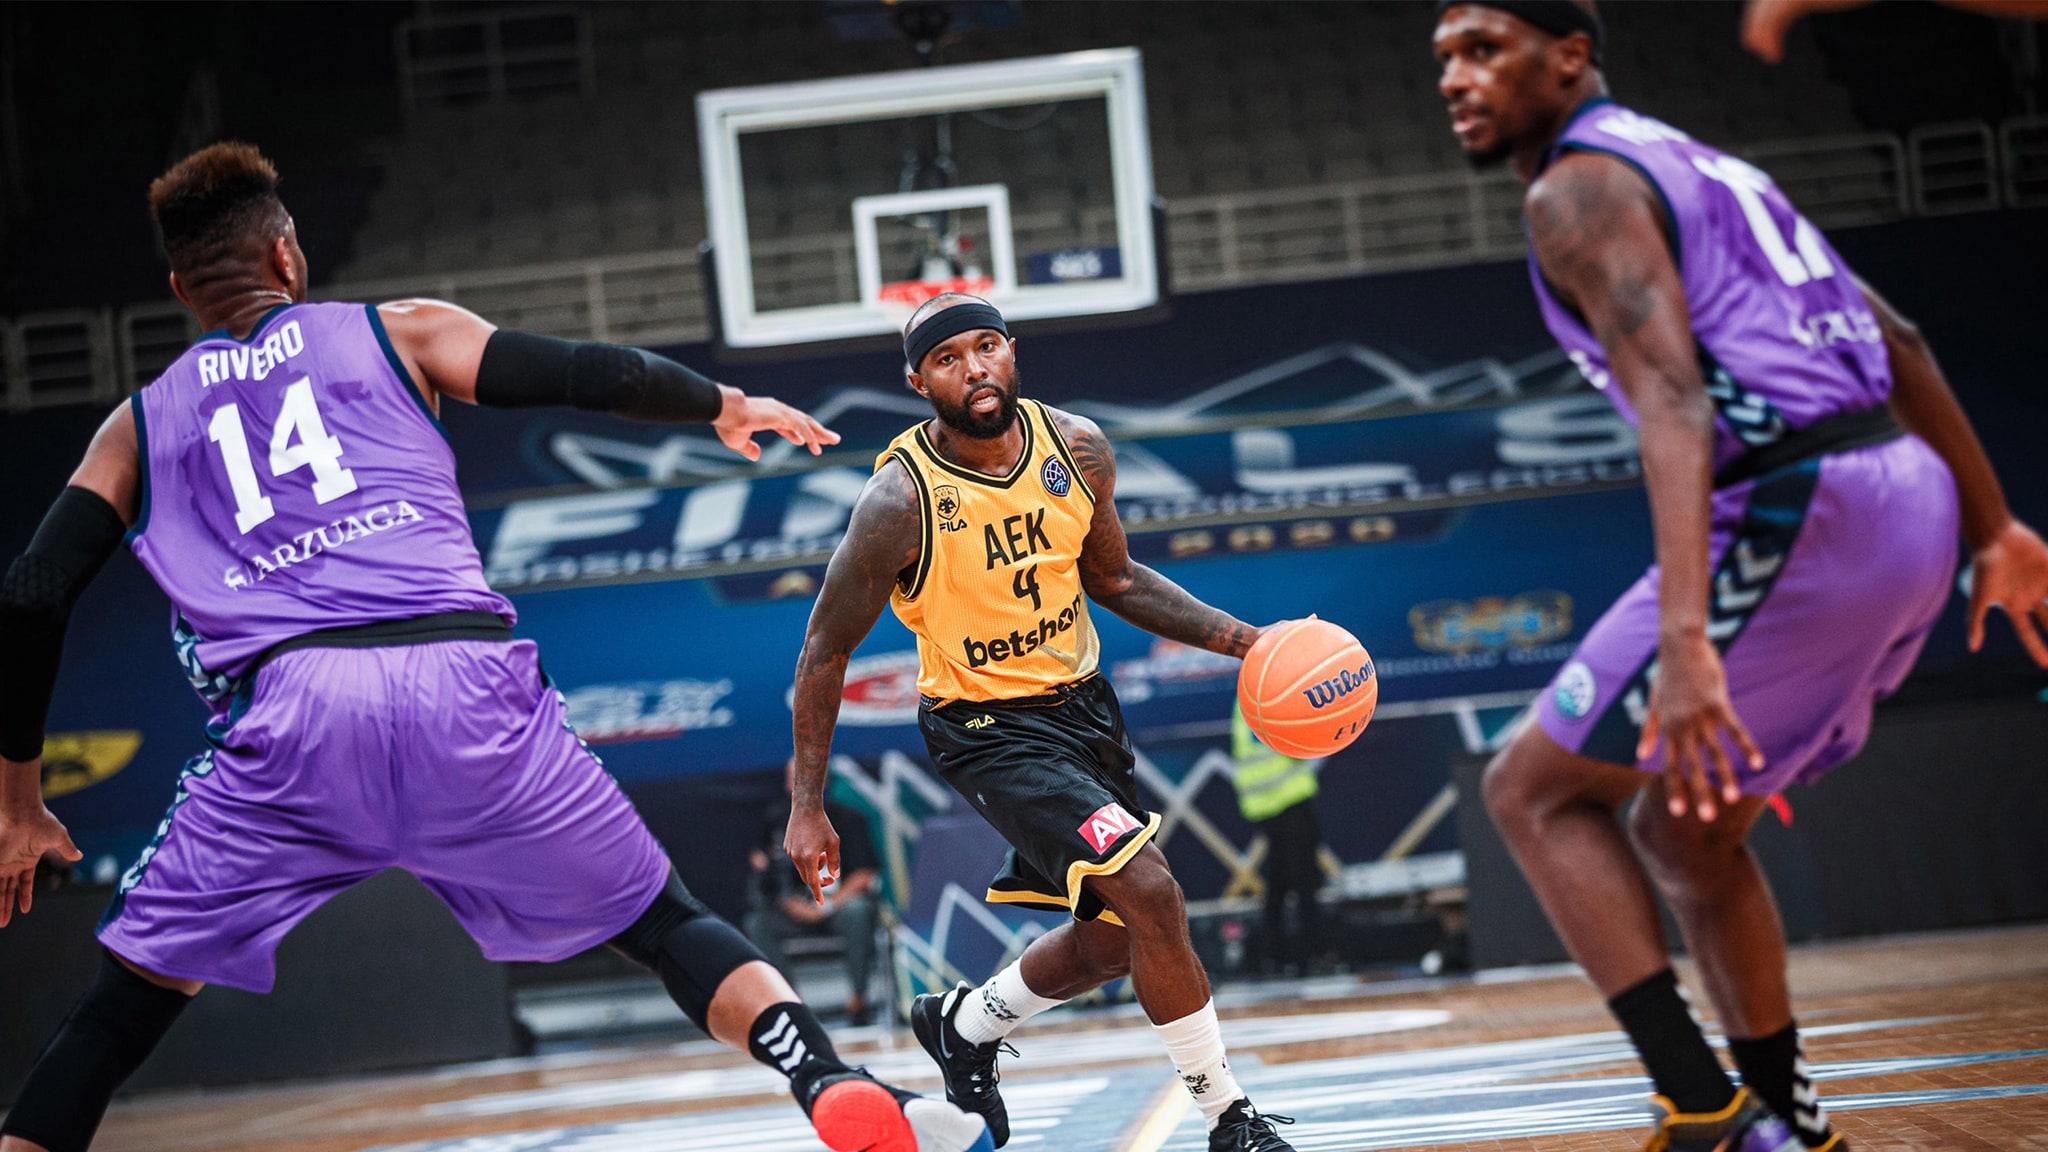 Rai Sport+ HD Basket Maschile - Champions League: Tenerife - Dinamo Sassari